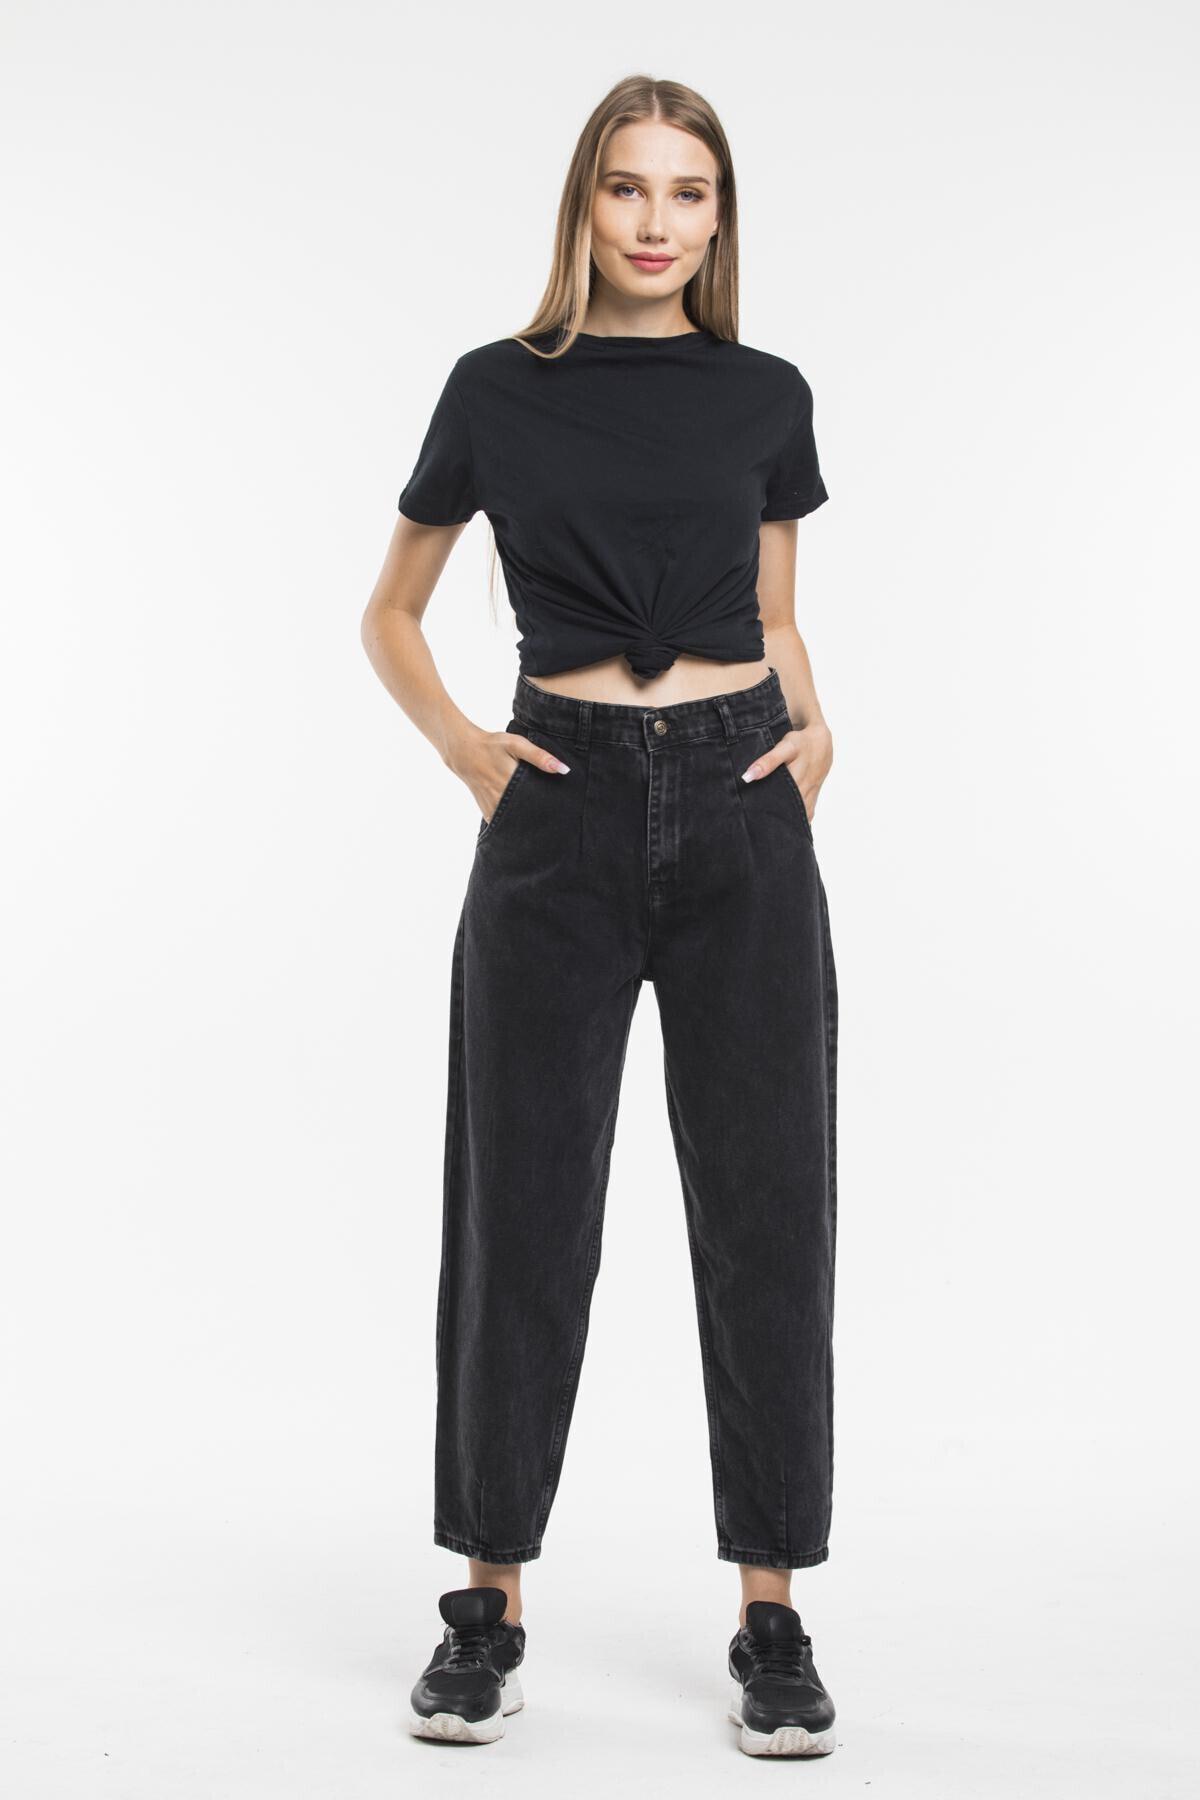 sarıbalon Siyah Pilili Yüksek Bel Ballon Jeans 1